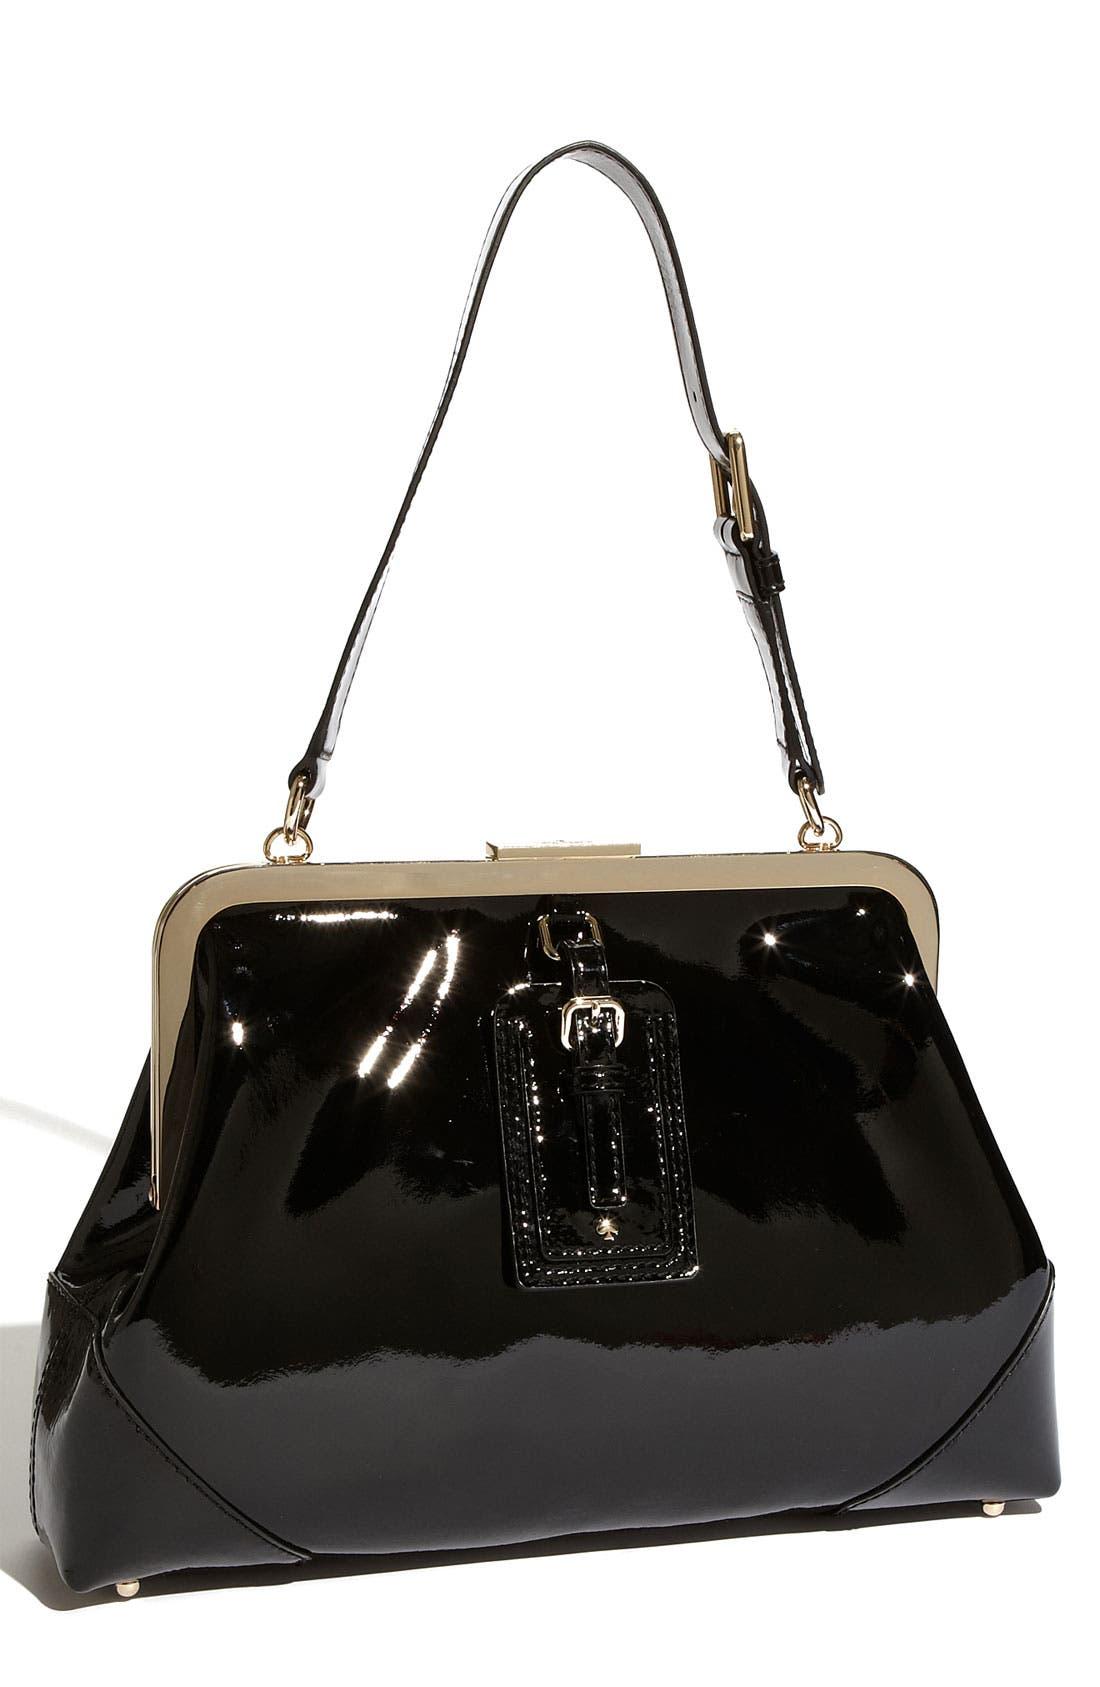 Alternate Image 1 Selected - kate spade new york 'barclay street - parker' patent leather shoulder bag